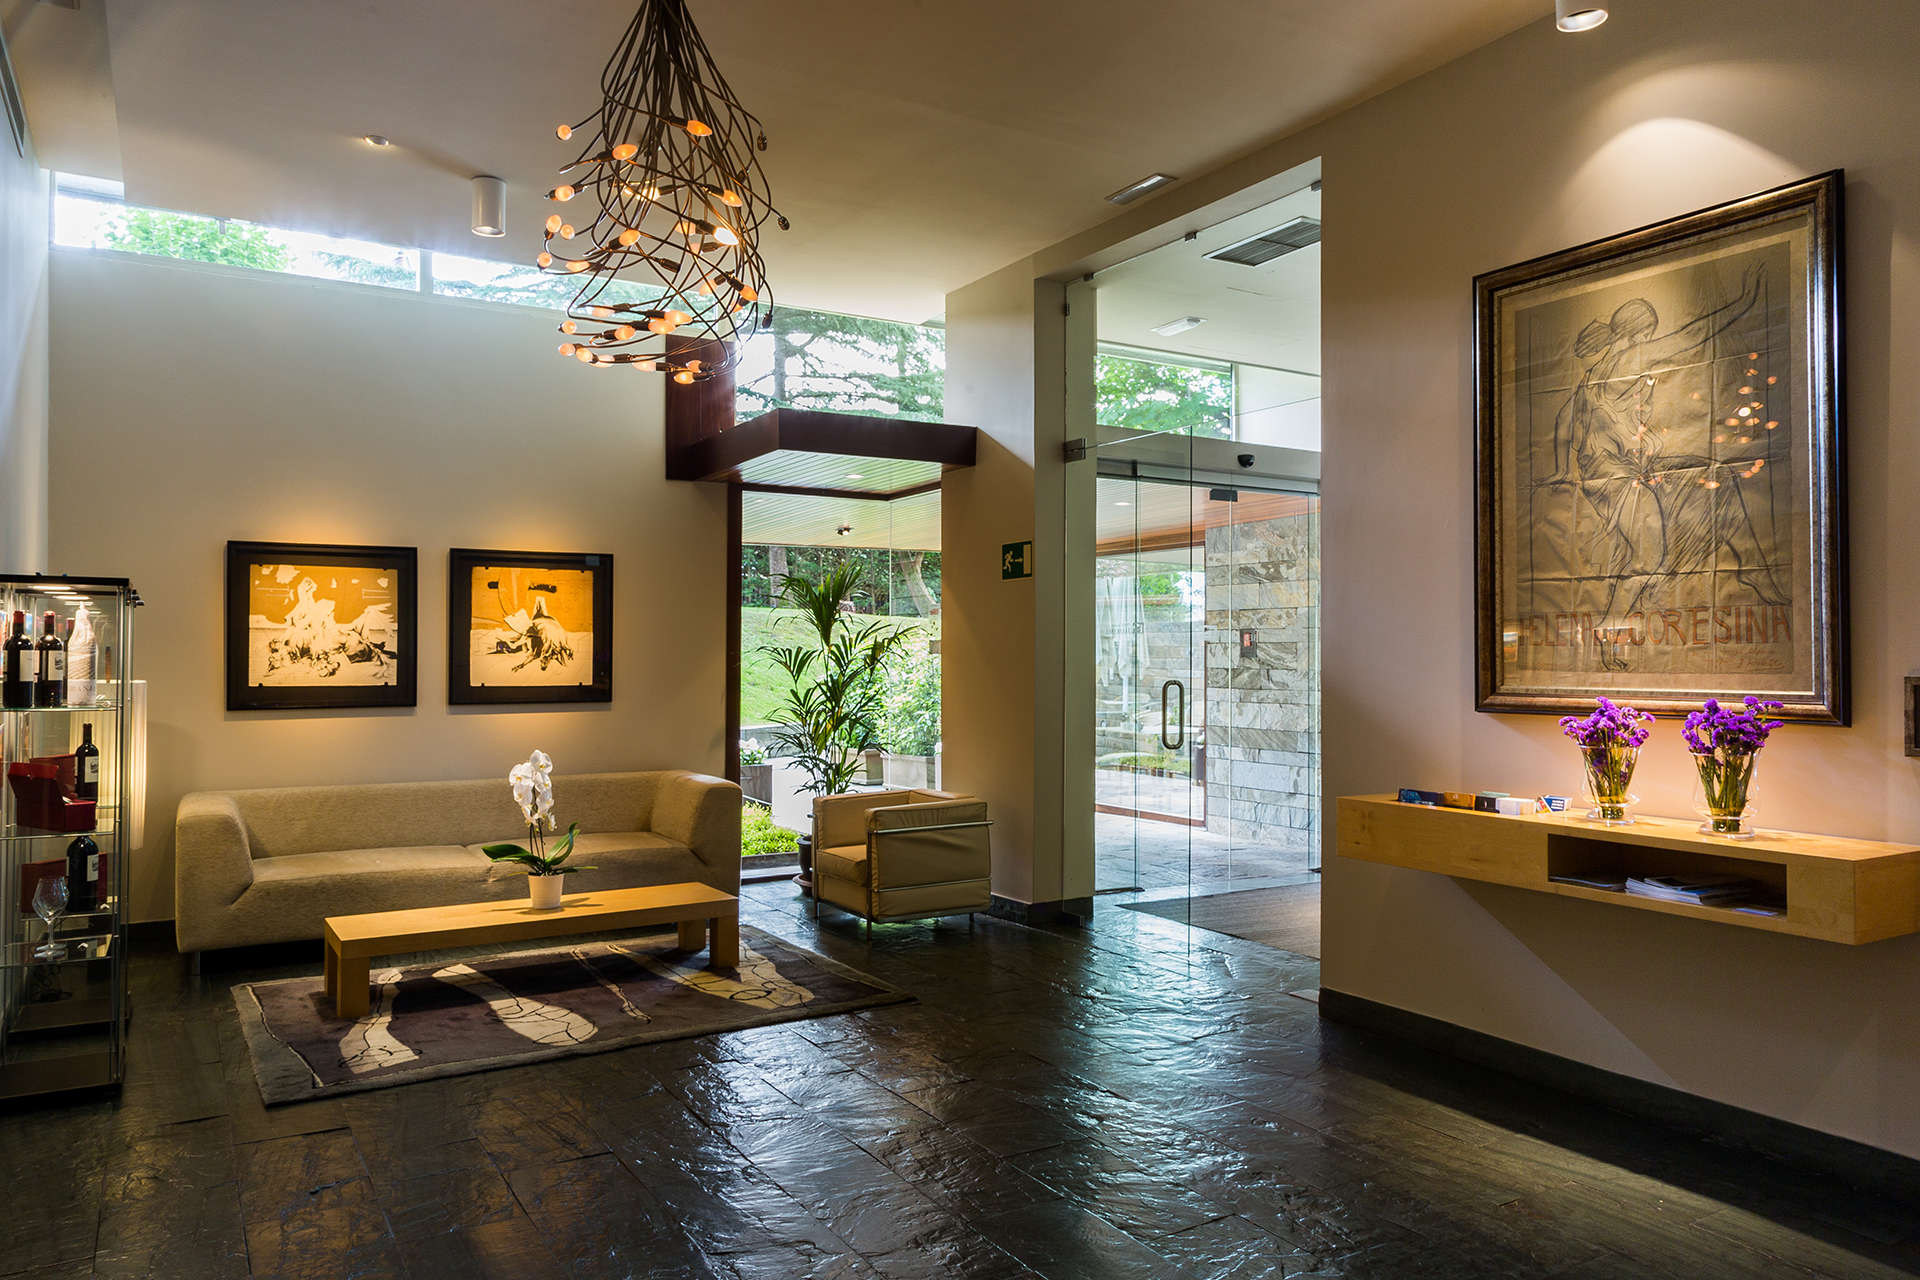 Recepción, Hotel Jaizkibel de Hondarribia